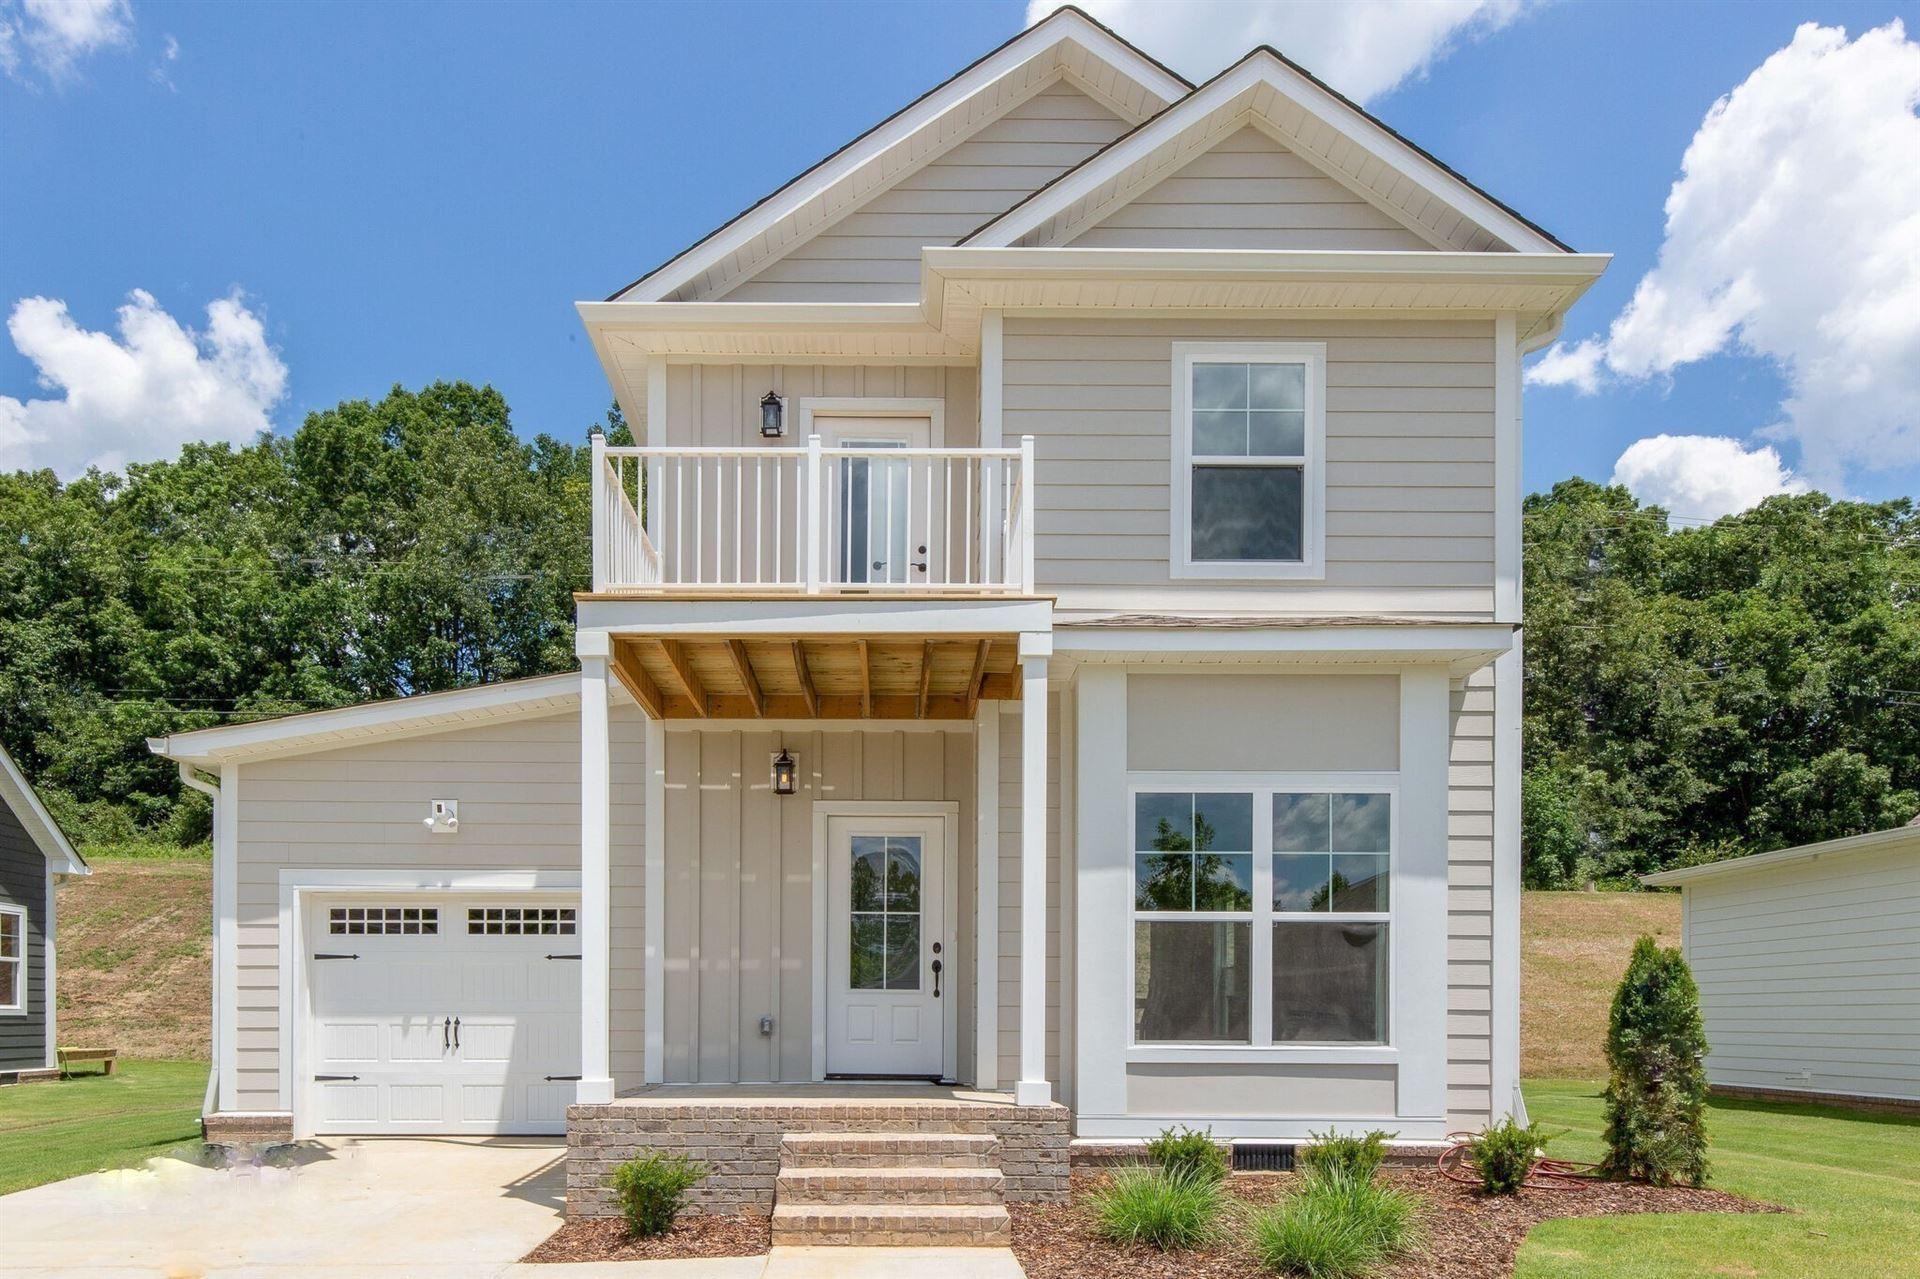 31 Sycamore Ridge East, Burns, TN 37029 - MLS#: 2195152